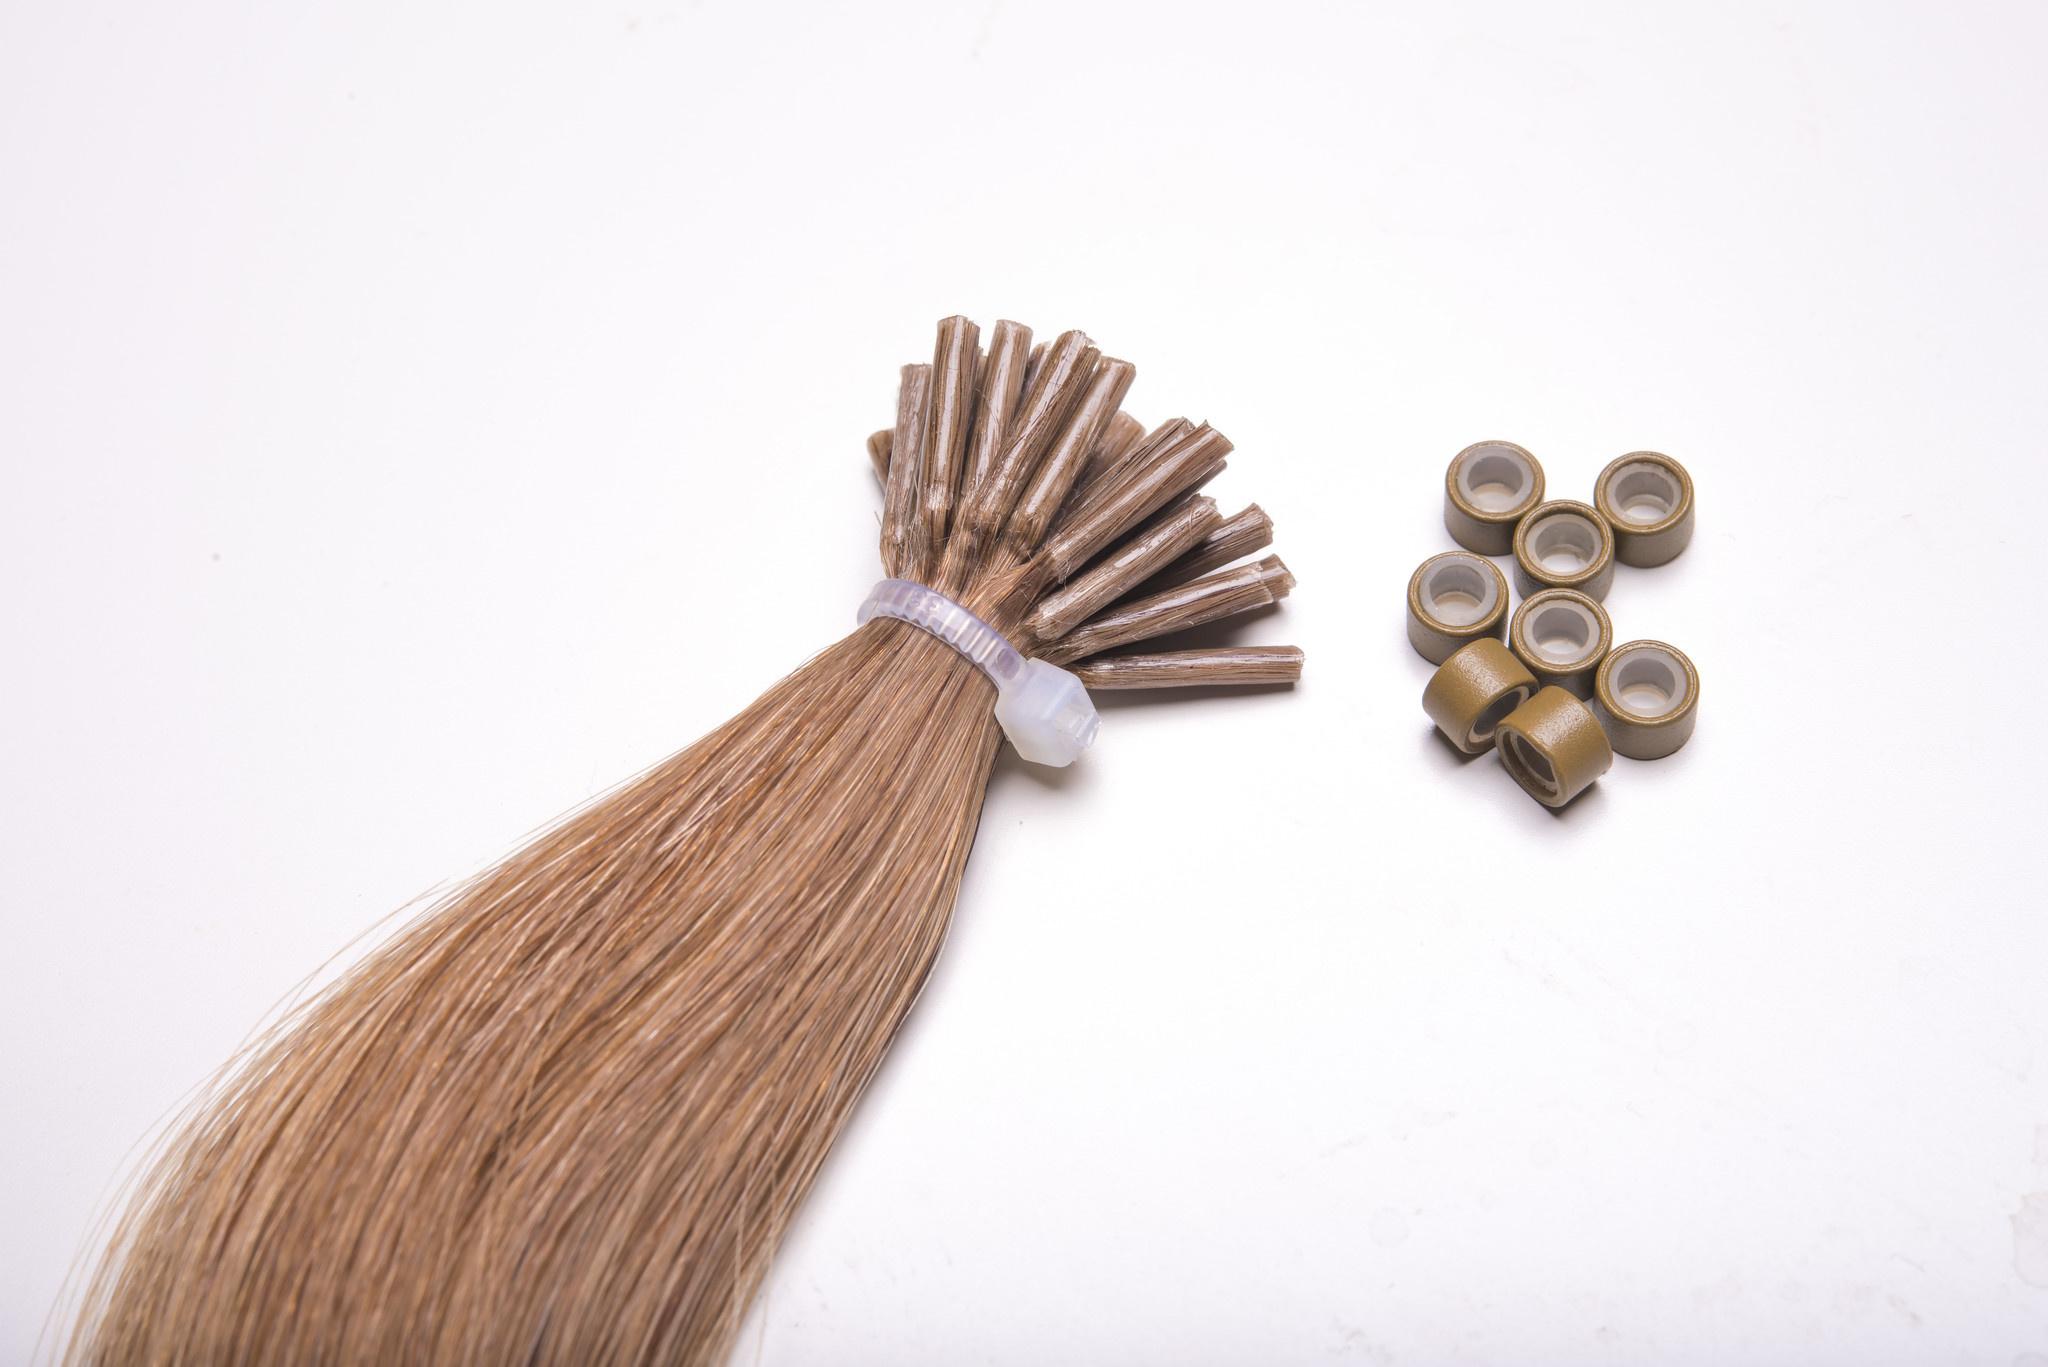 SilverFox Microring Extensions - Steil -  #4 Chocolate Brown